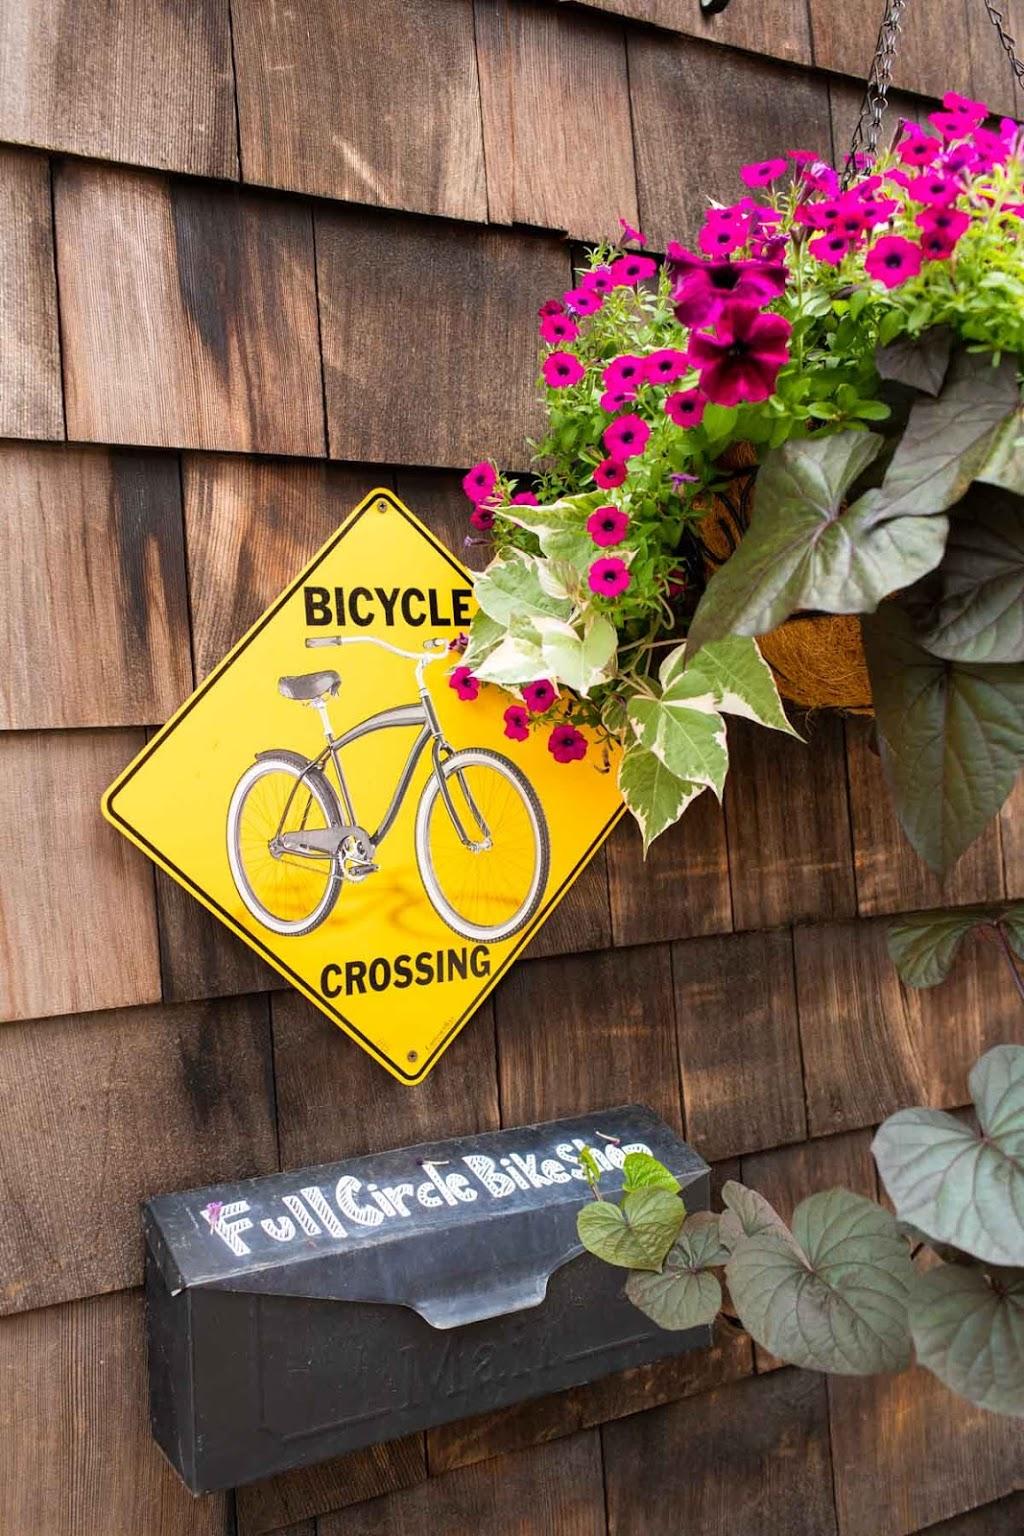 Full Circle Bike Shop - bicycle store  | Photo 5 of 9 | Address: 30 N Maple St, Florence, MA 01062, USA | Phone: (413) 585-8700